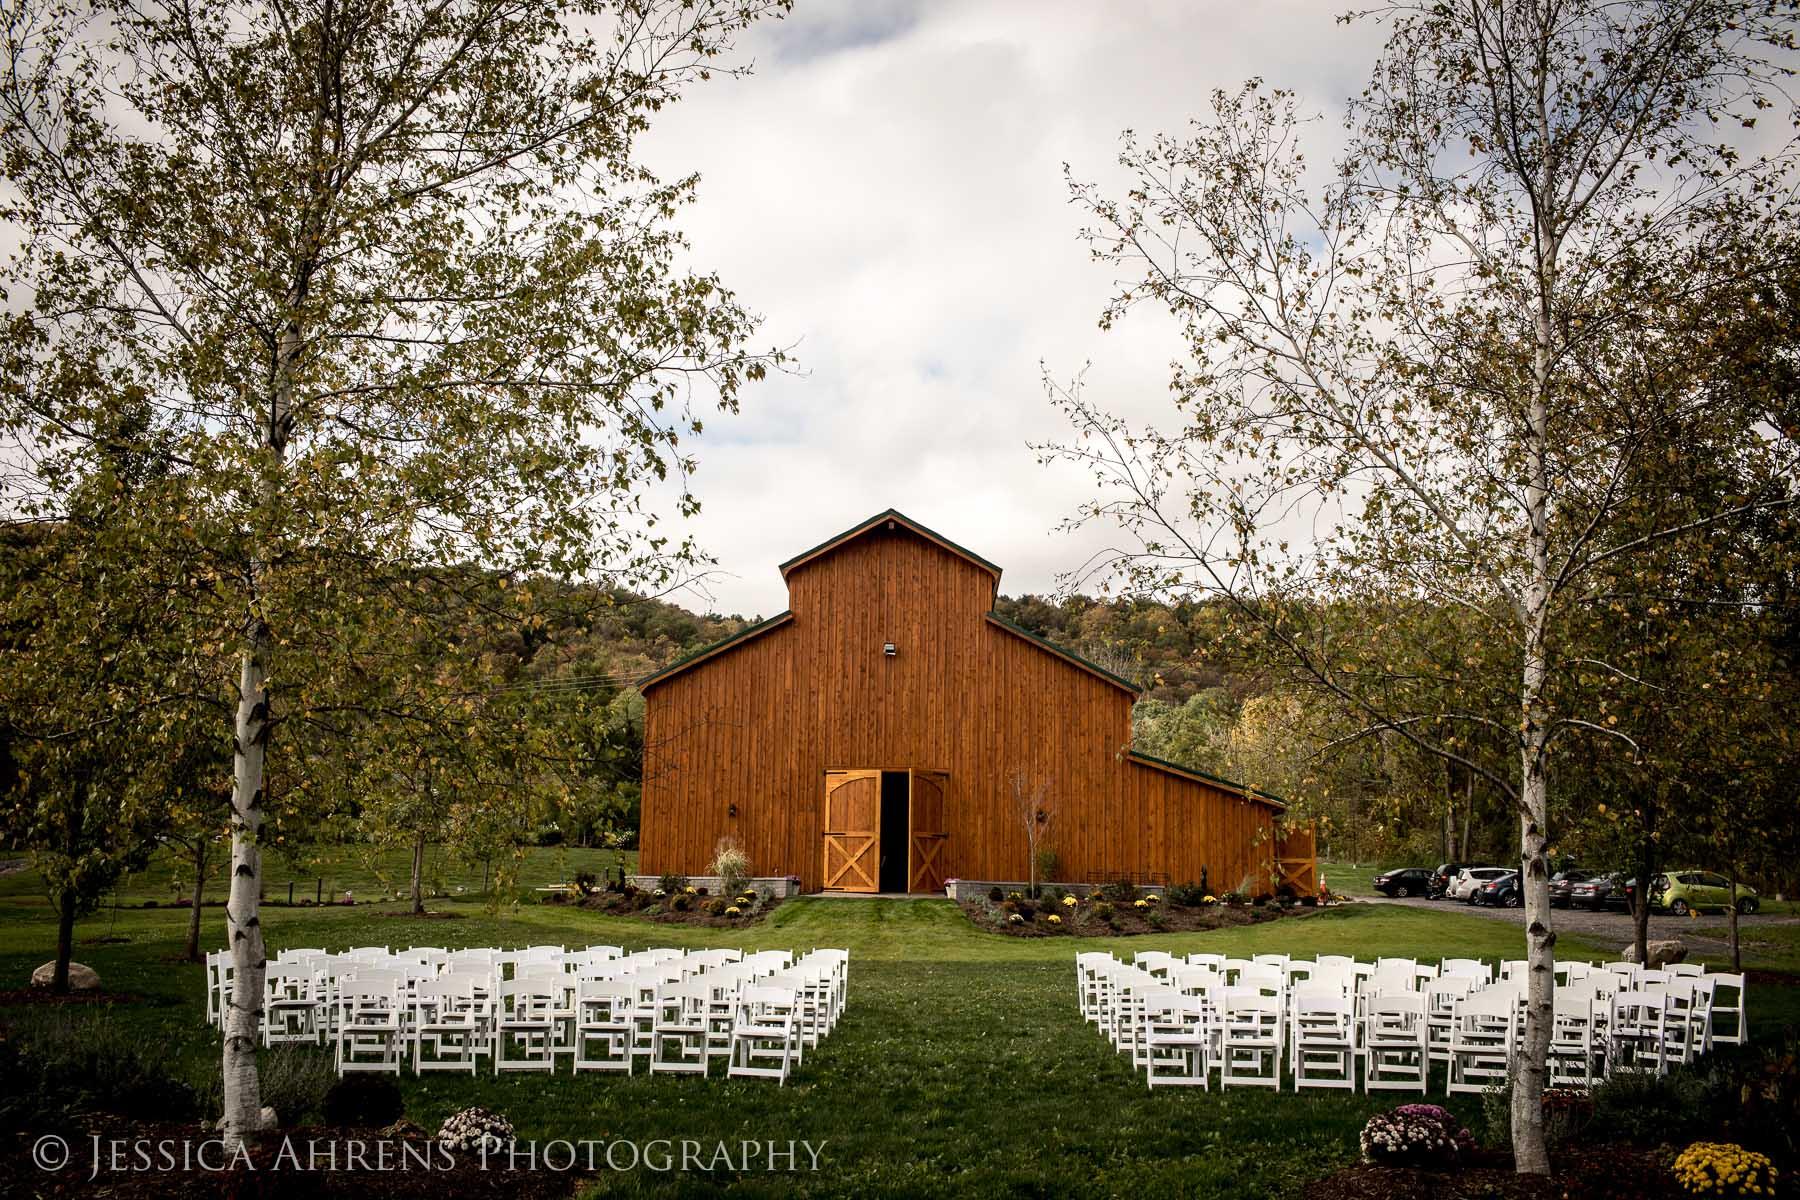 The-Orchards-Barn-Wedding-Venue-Syracuse- (9).jpg